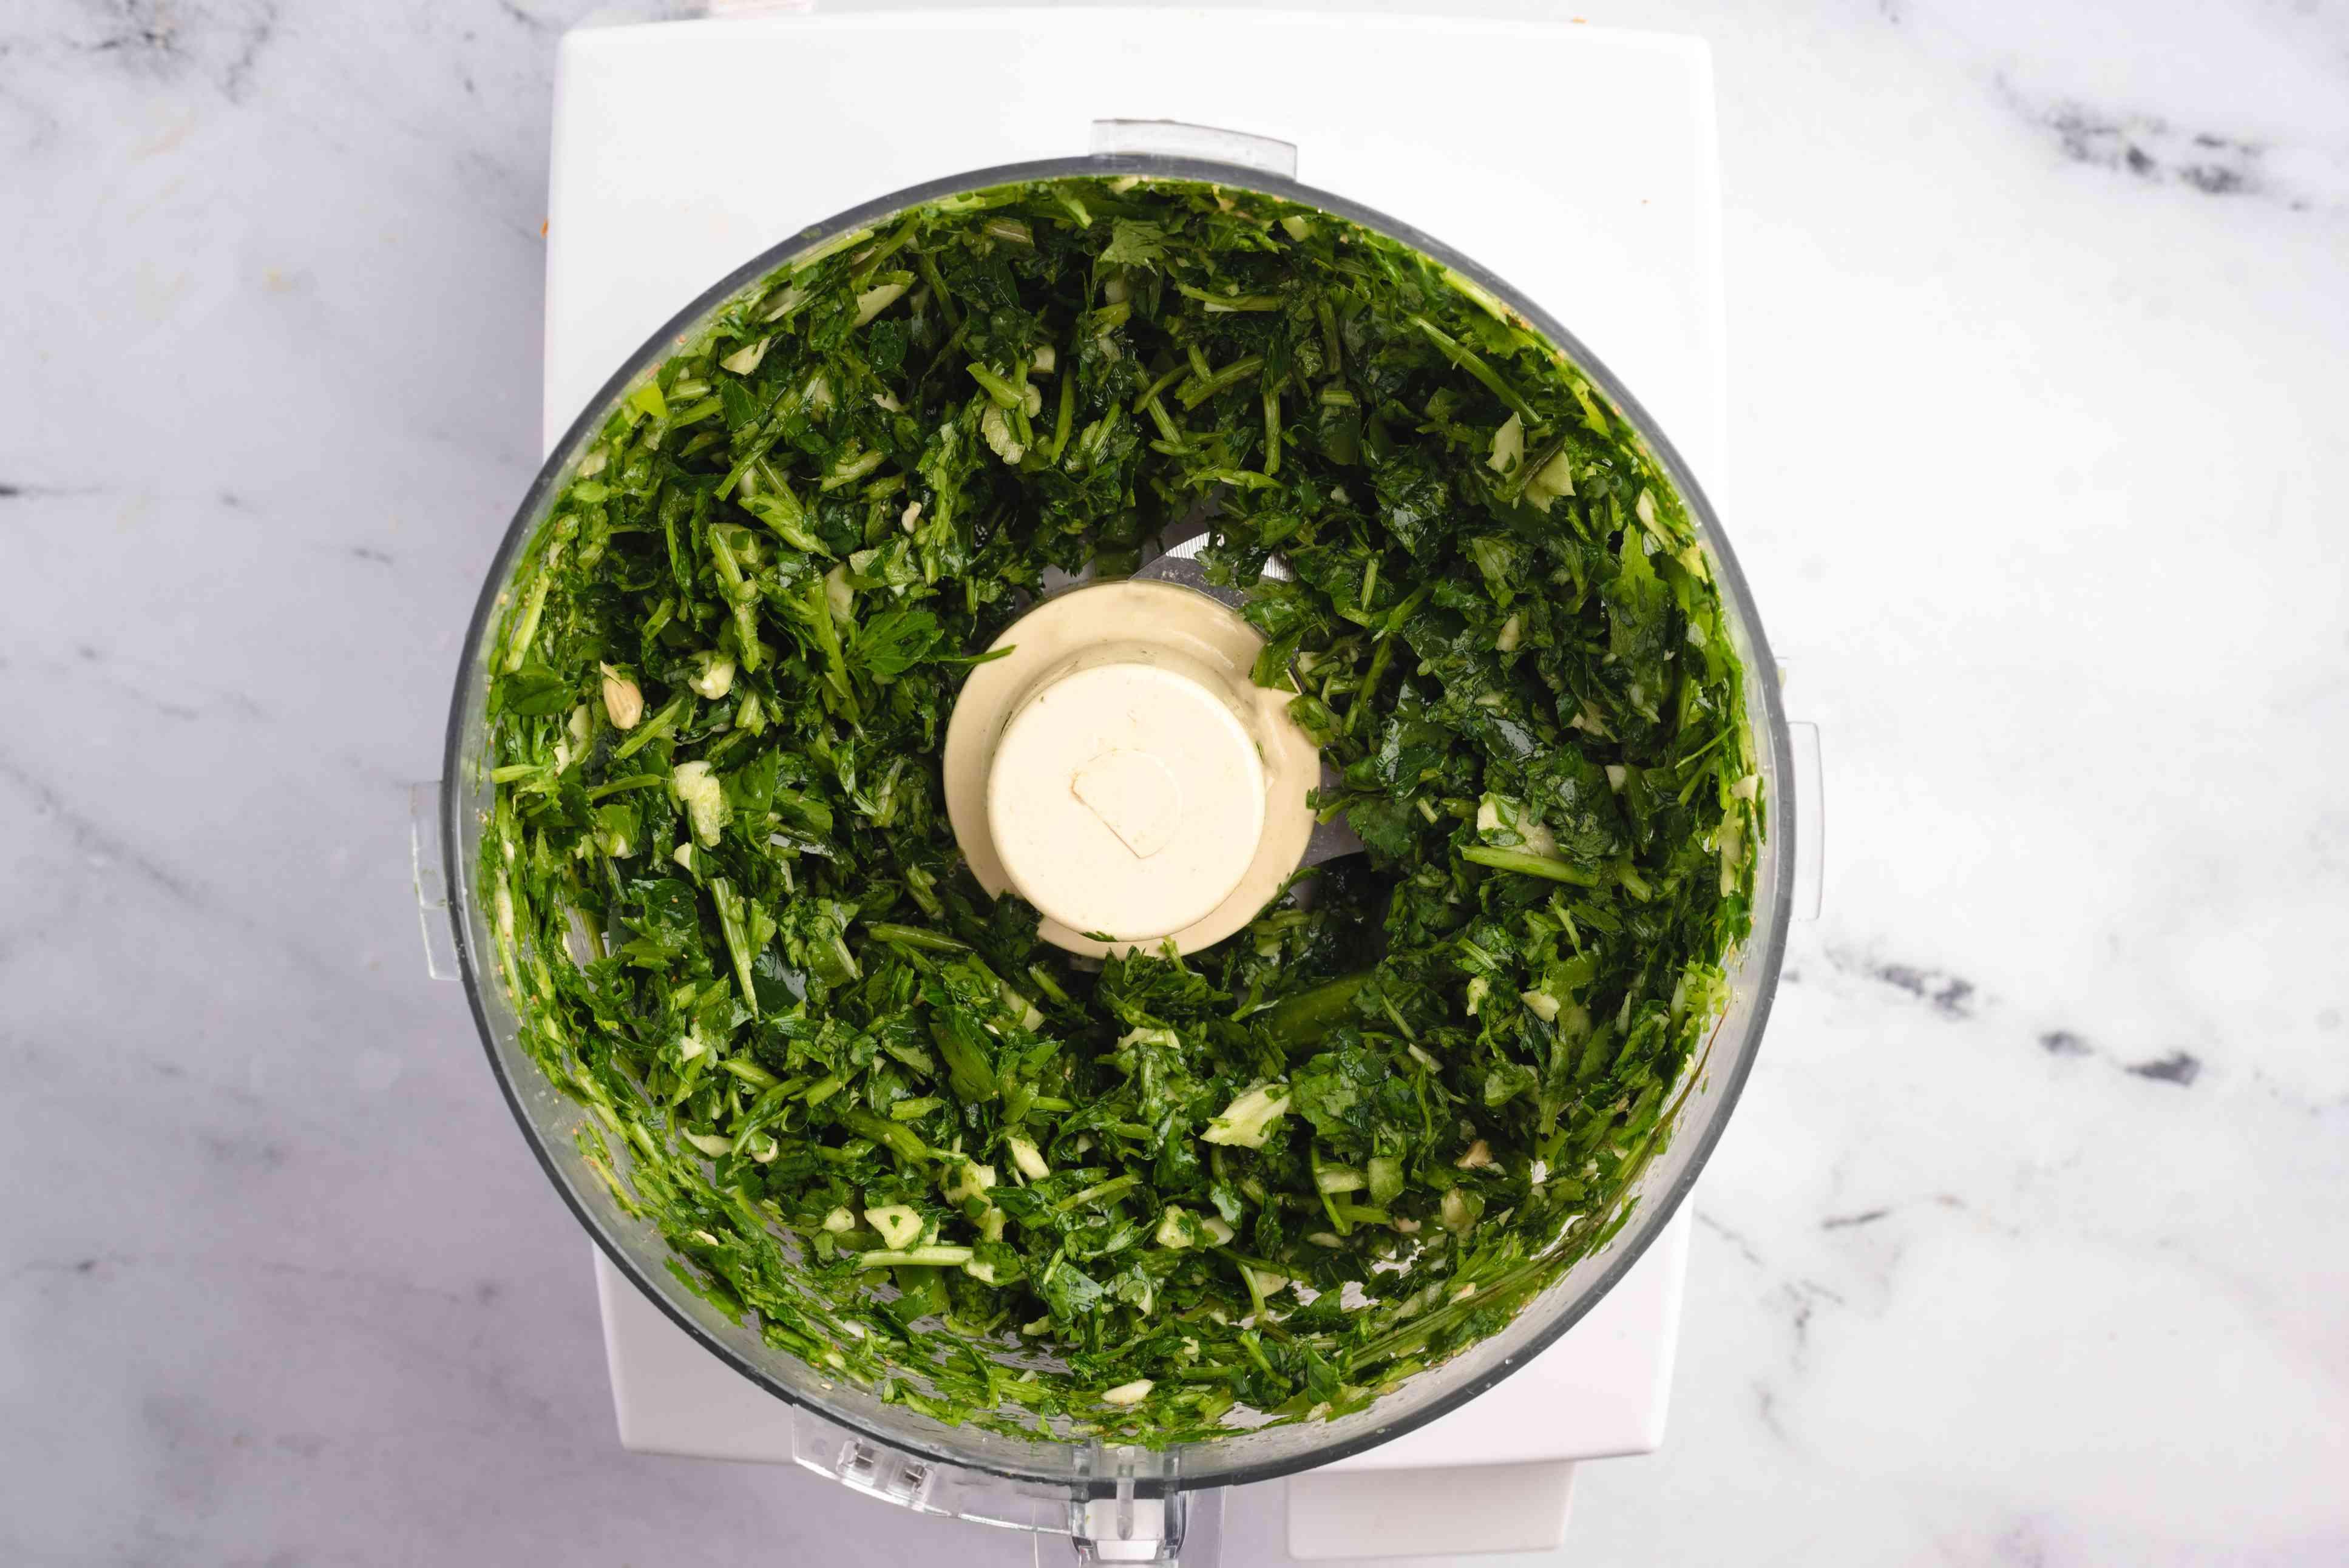 Garlic cloves, parsley, cilantro, lemon juice, salt, ground cumin, and ground coriander in a food processor